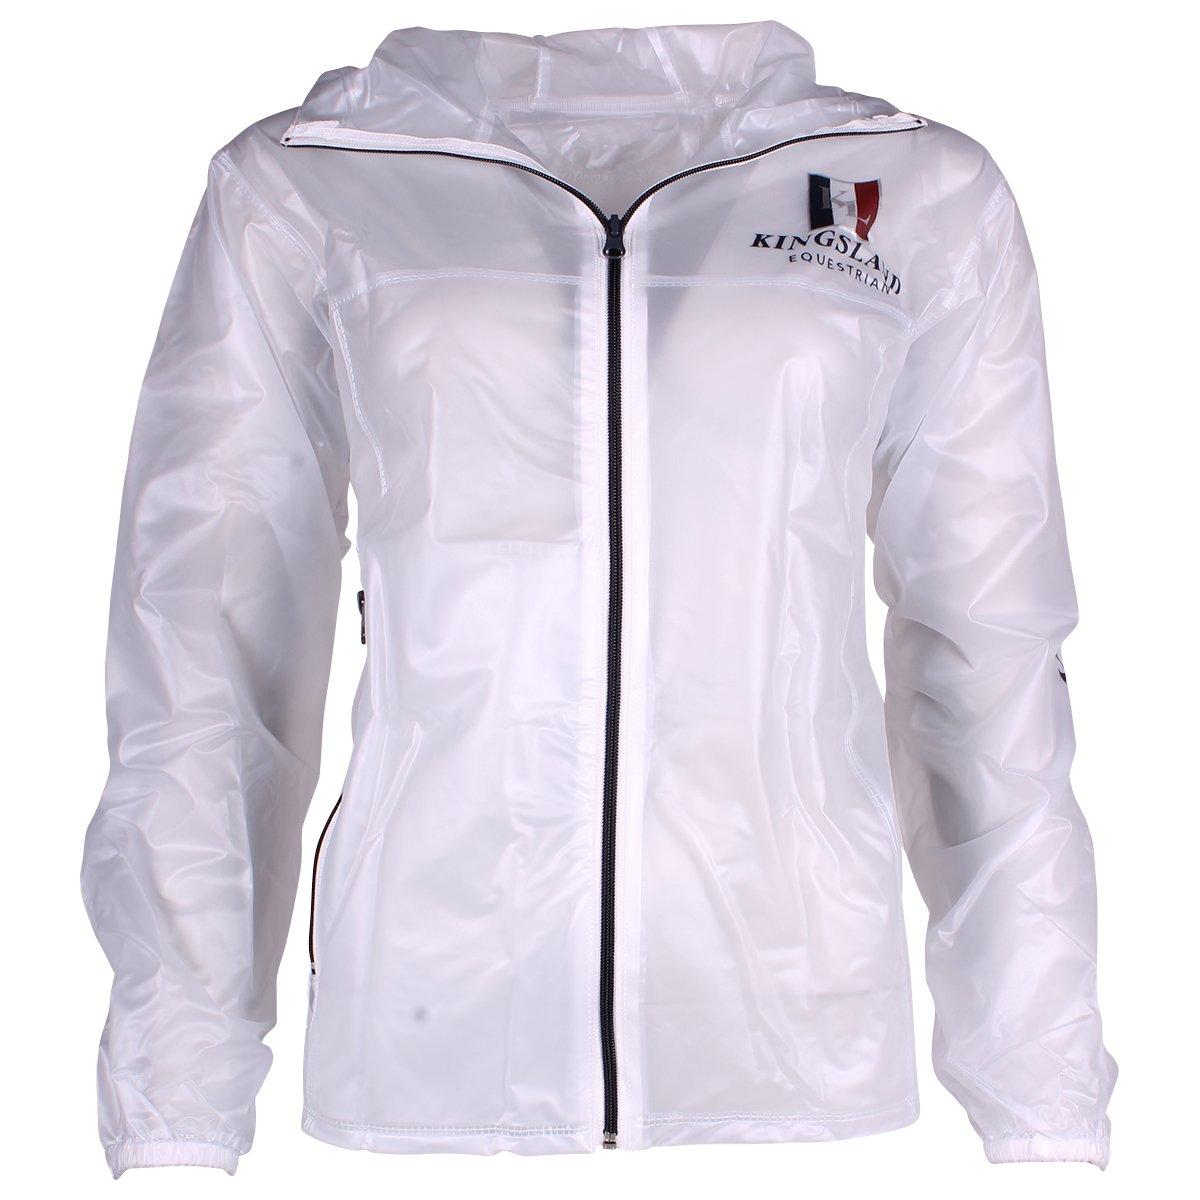 Chubasquero o chaqueta Kingsland para lluvia.